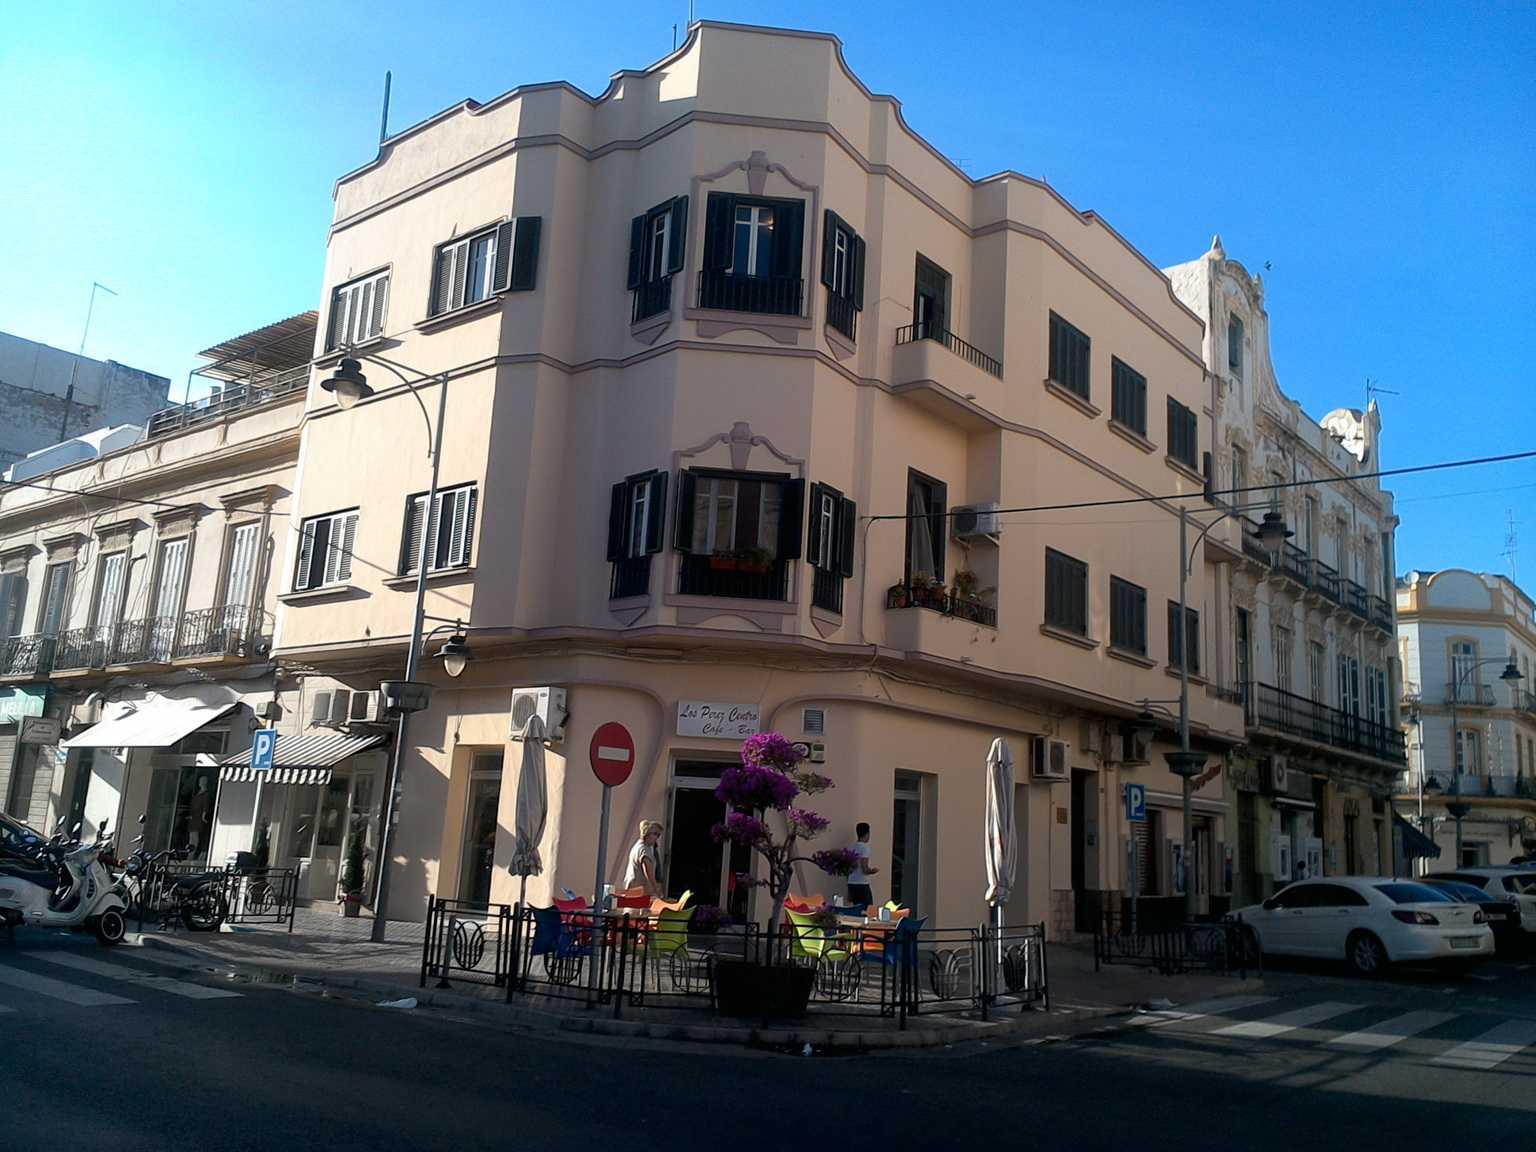 Calle del General Pareja, 5